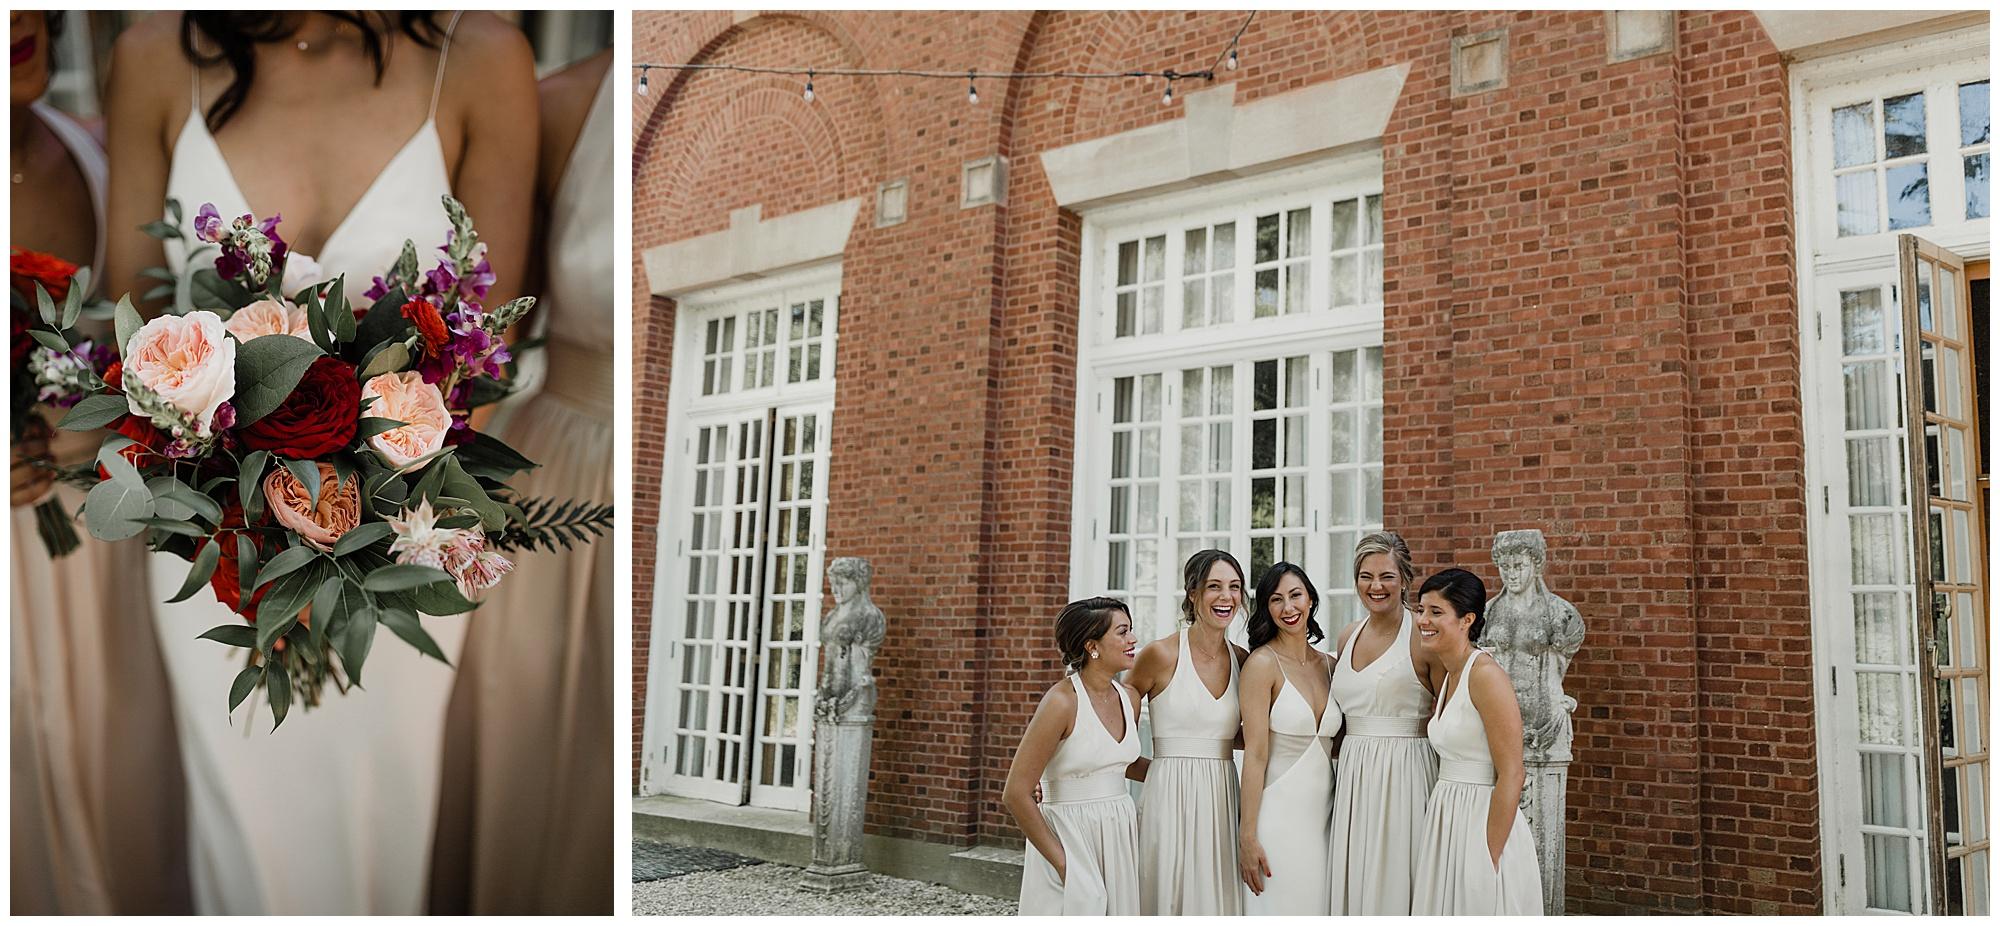 allerton_park_wedding_champaign_il_chicago_wright_photographs_ne_0026.jpg